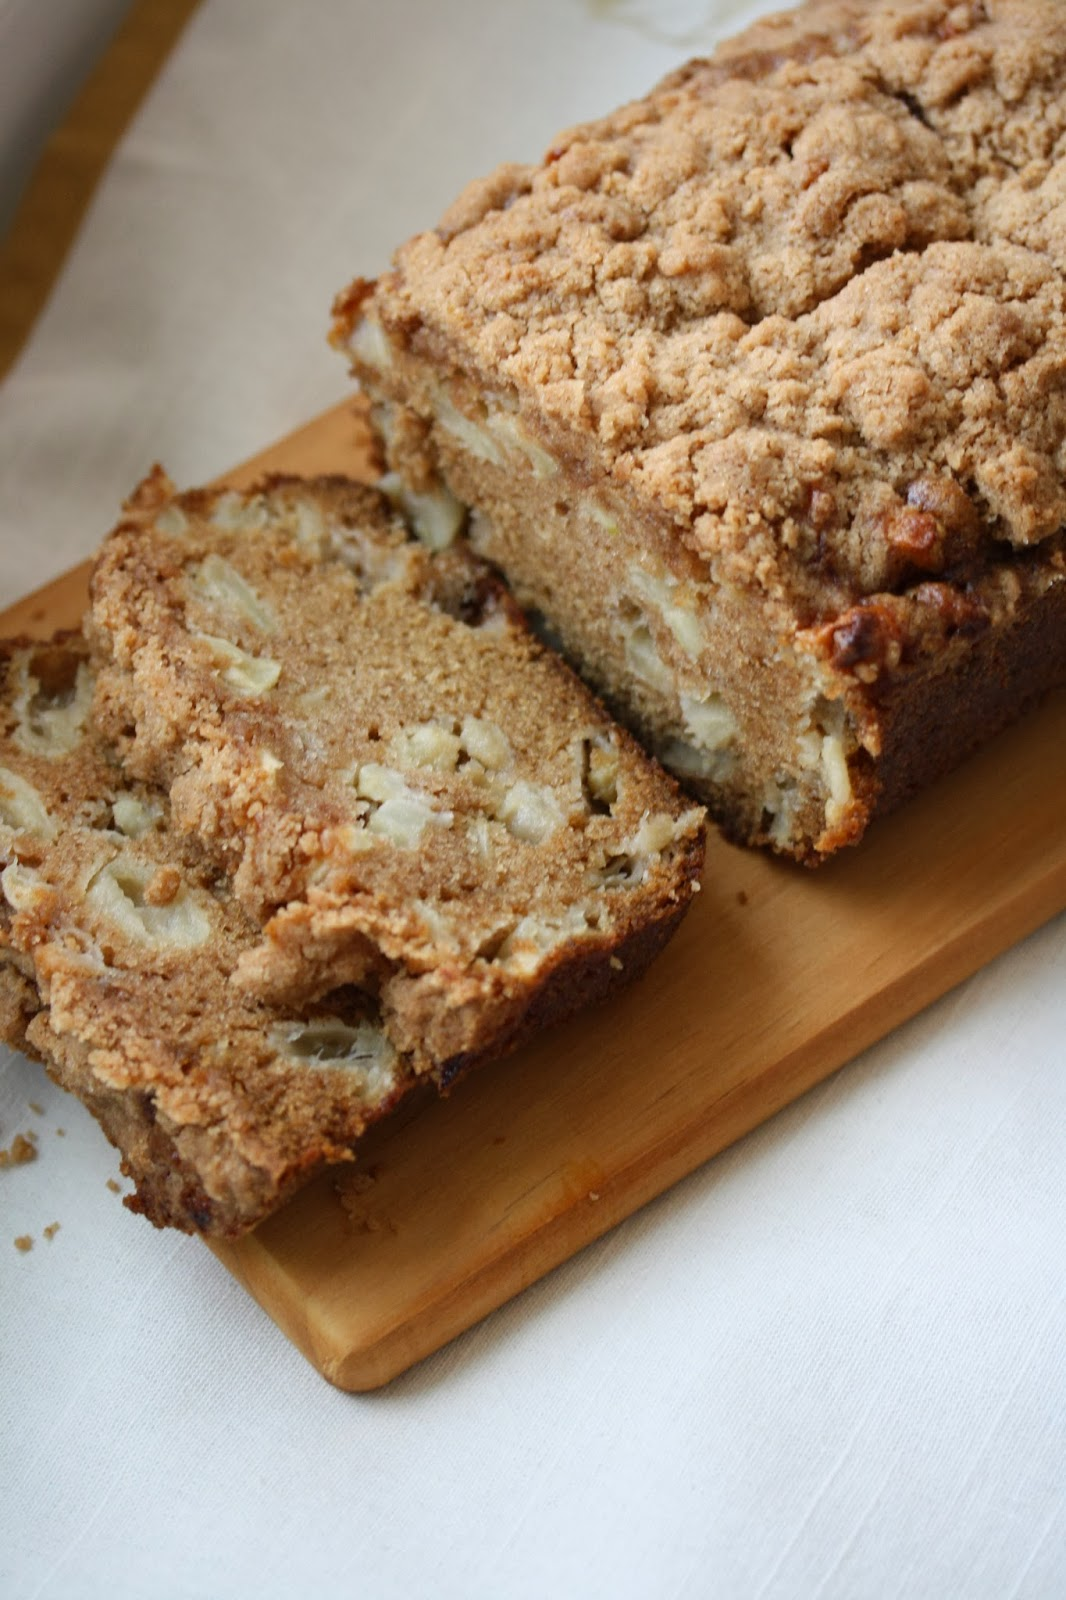 ... cinnamon bread eat apple cinnamon bread gift apple cinnamon bread